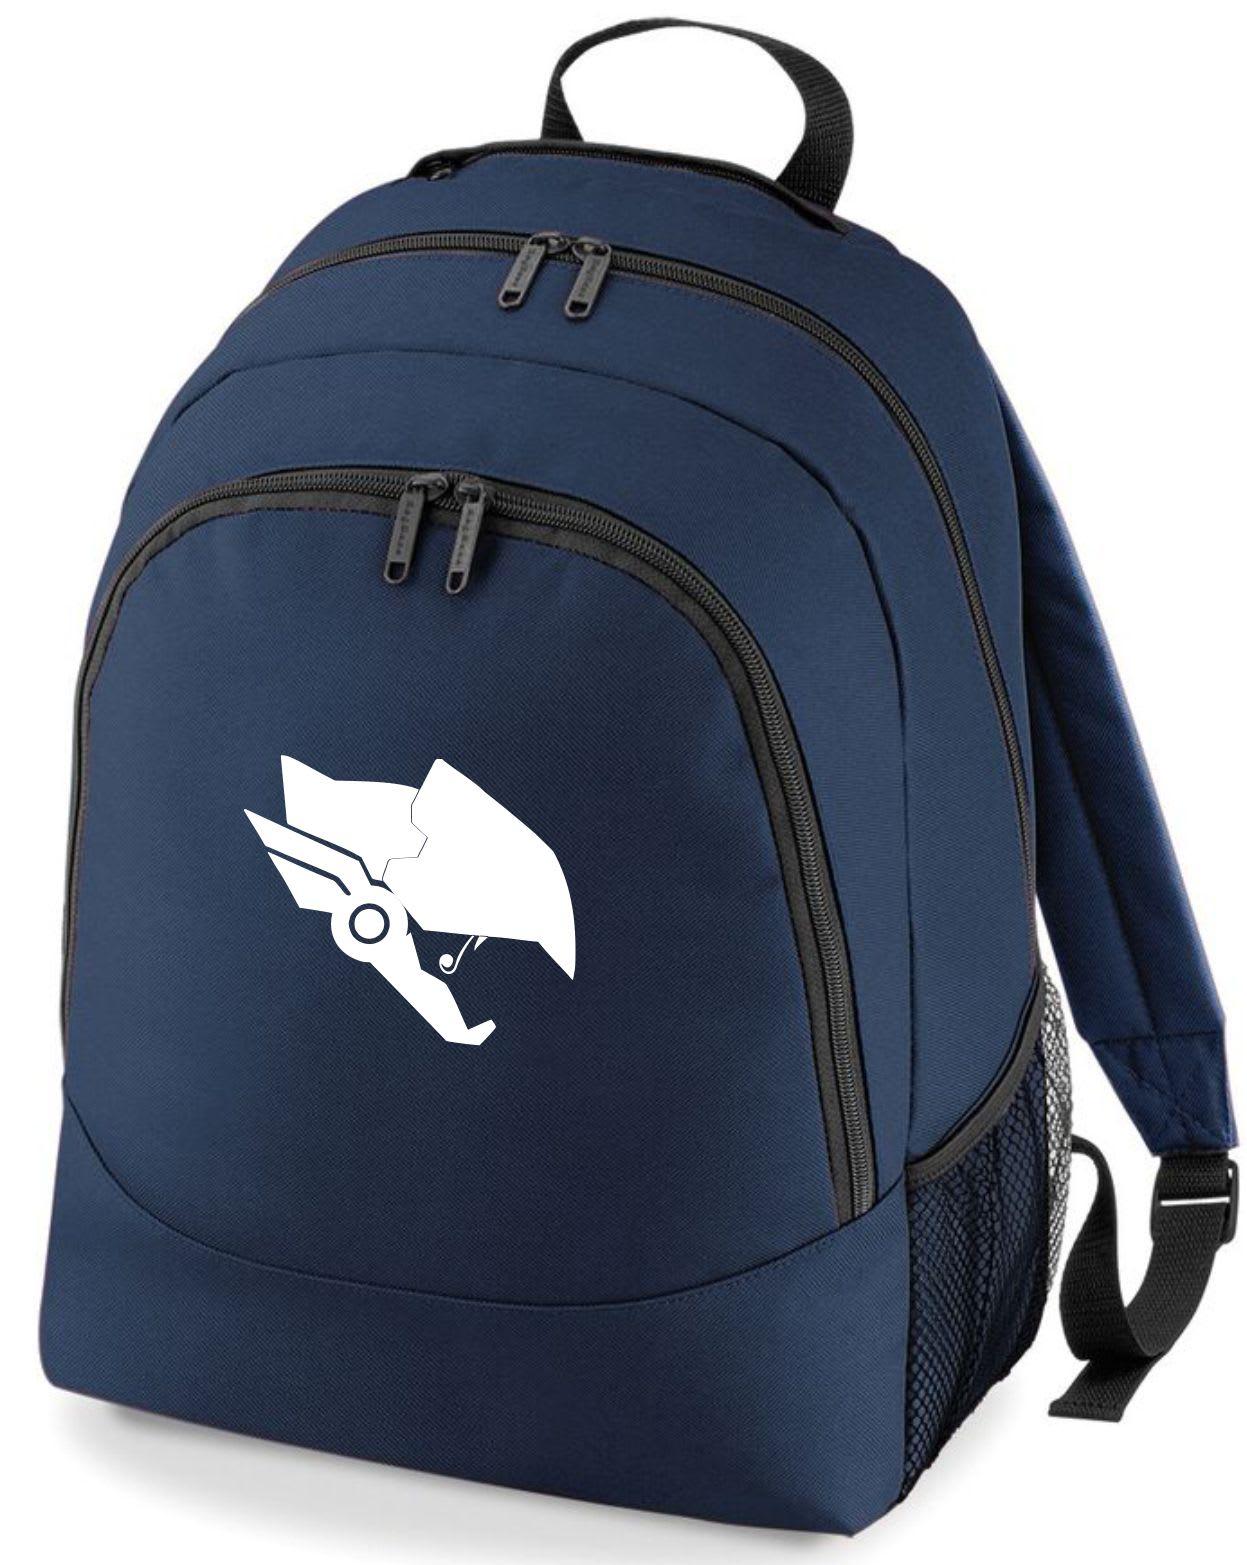 Overwatch Pharah Rucksack Bag